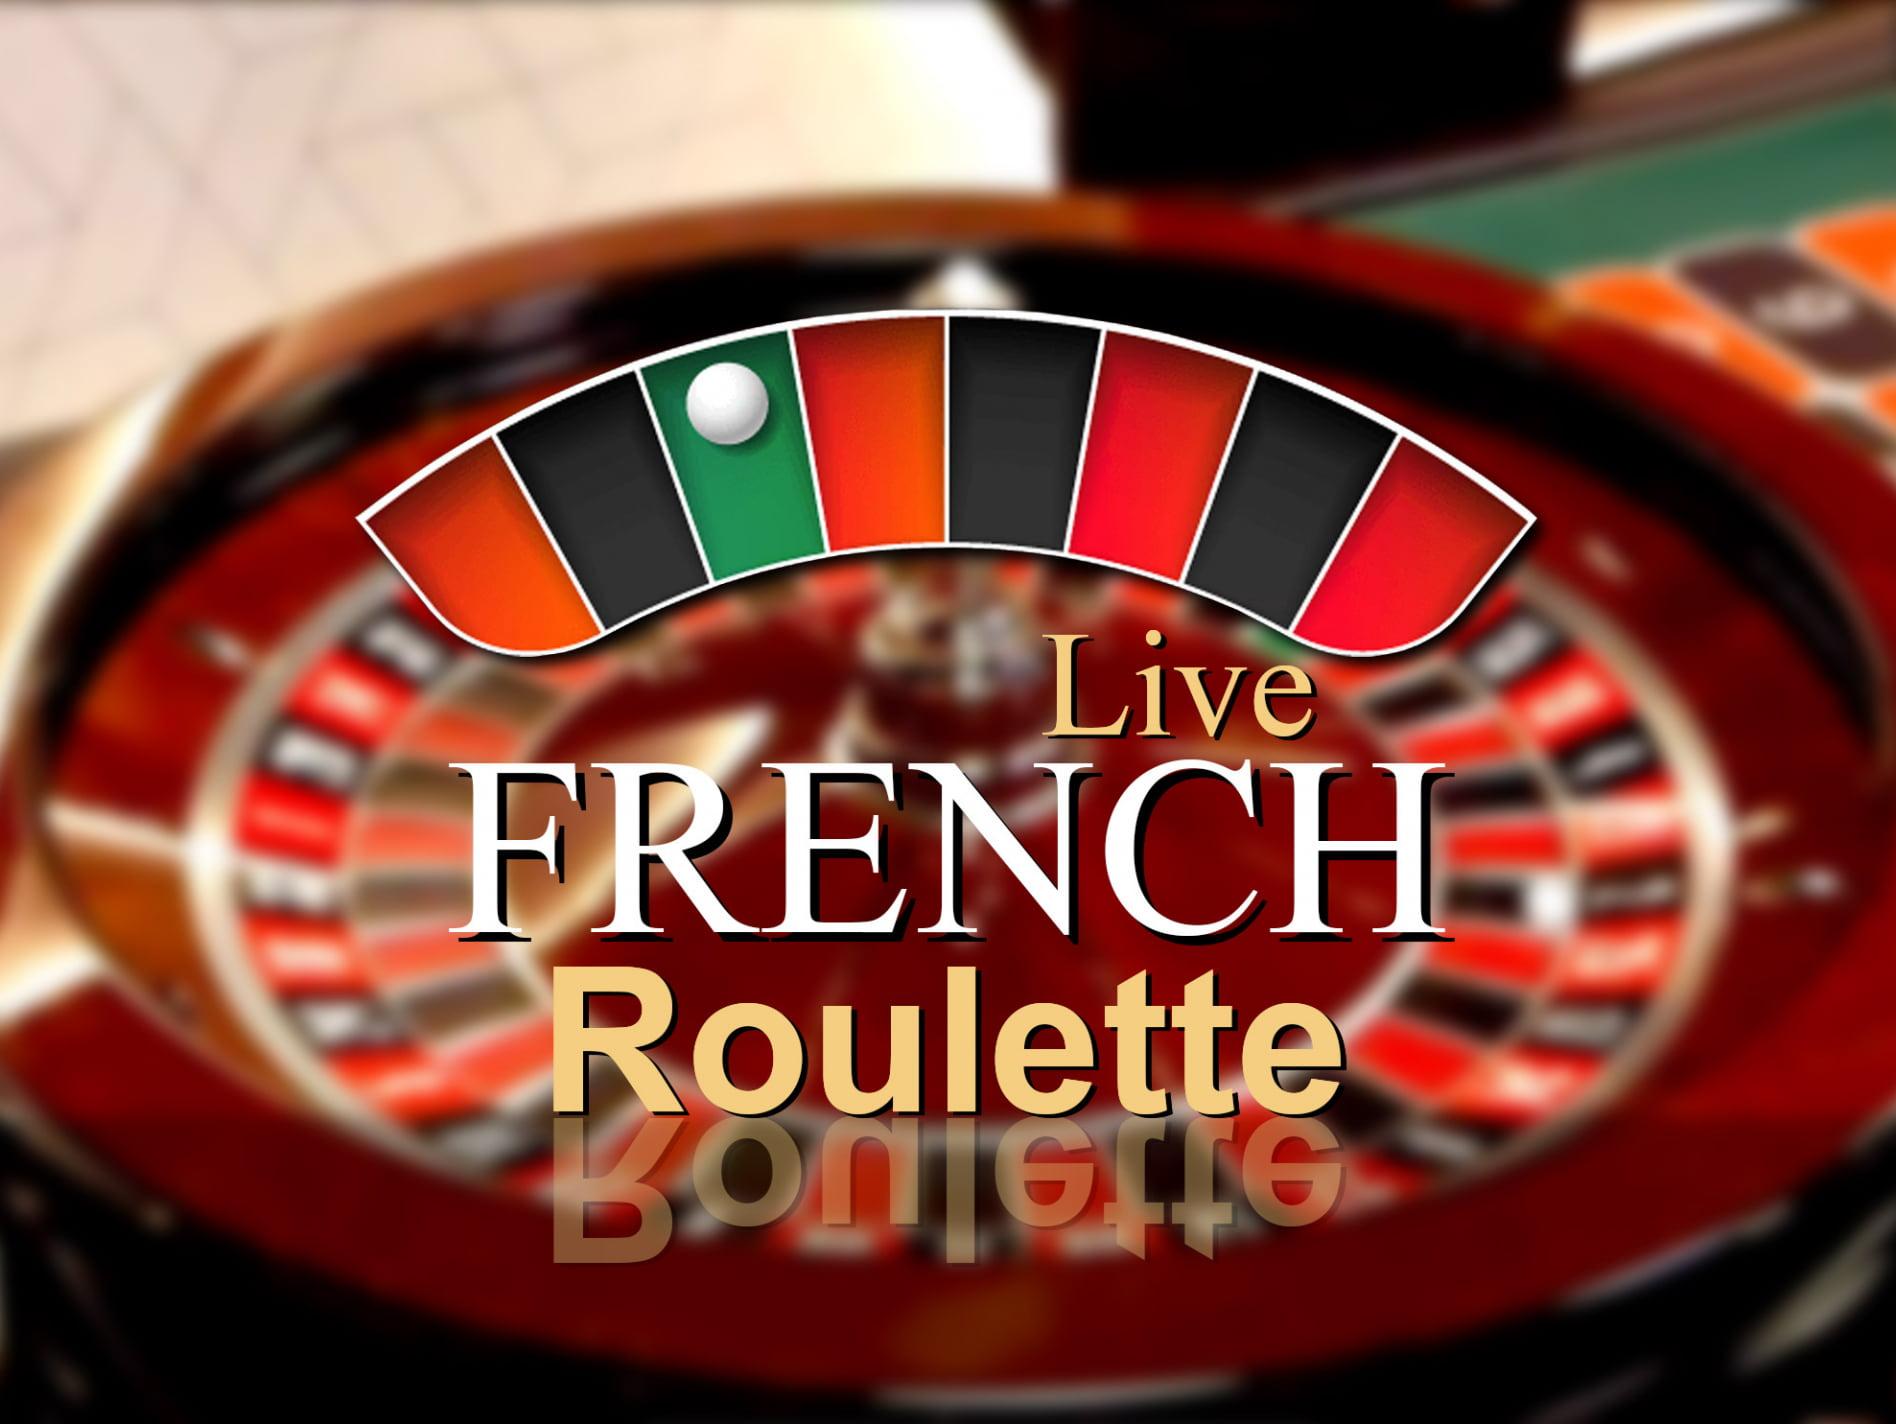 Jugar ruleta francesa gratis como loteria La Serena-309233